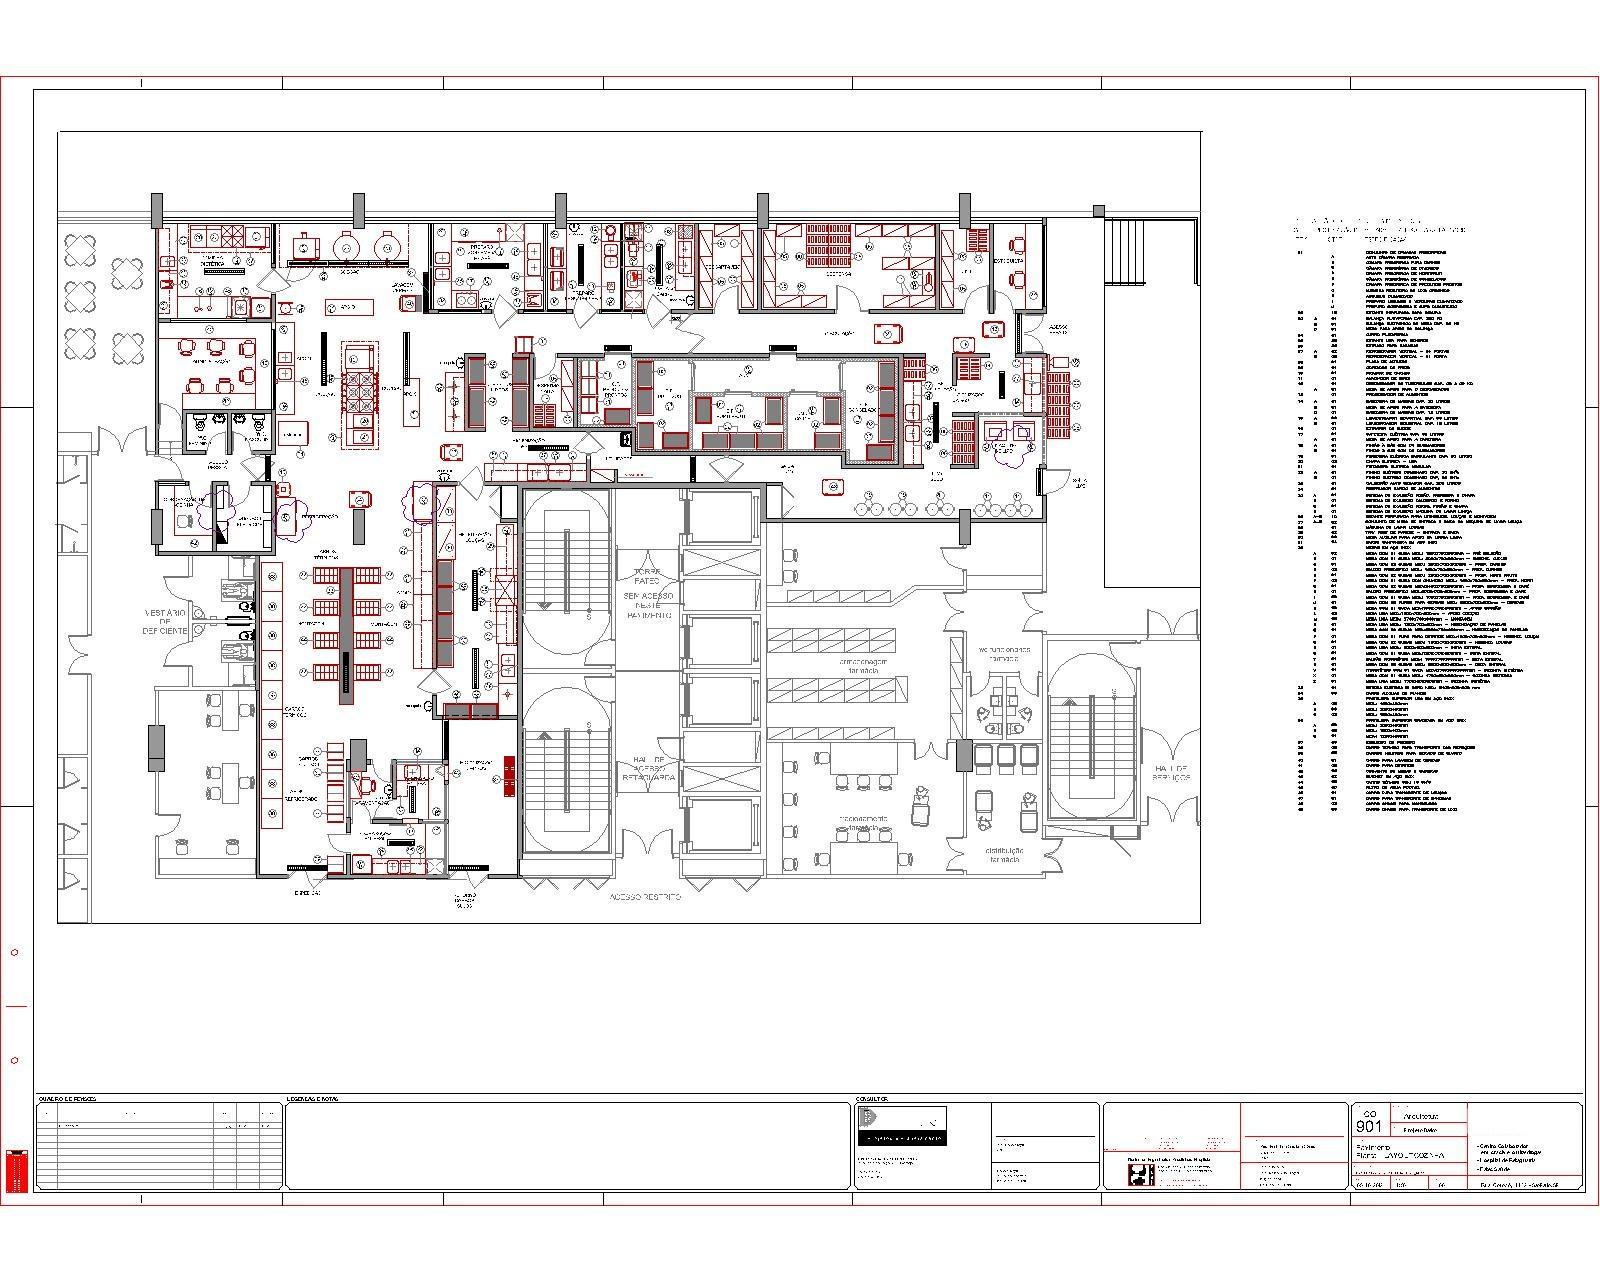 Ante projeto Hospitalar Dimensão #BB1010 1600 1280